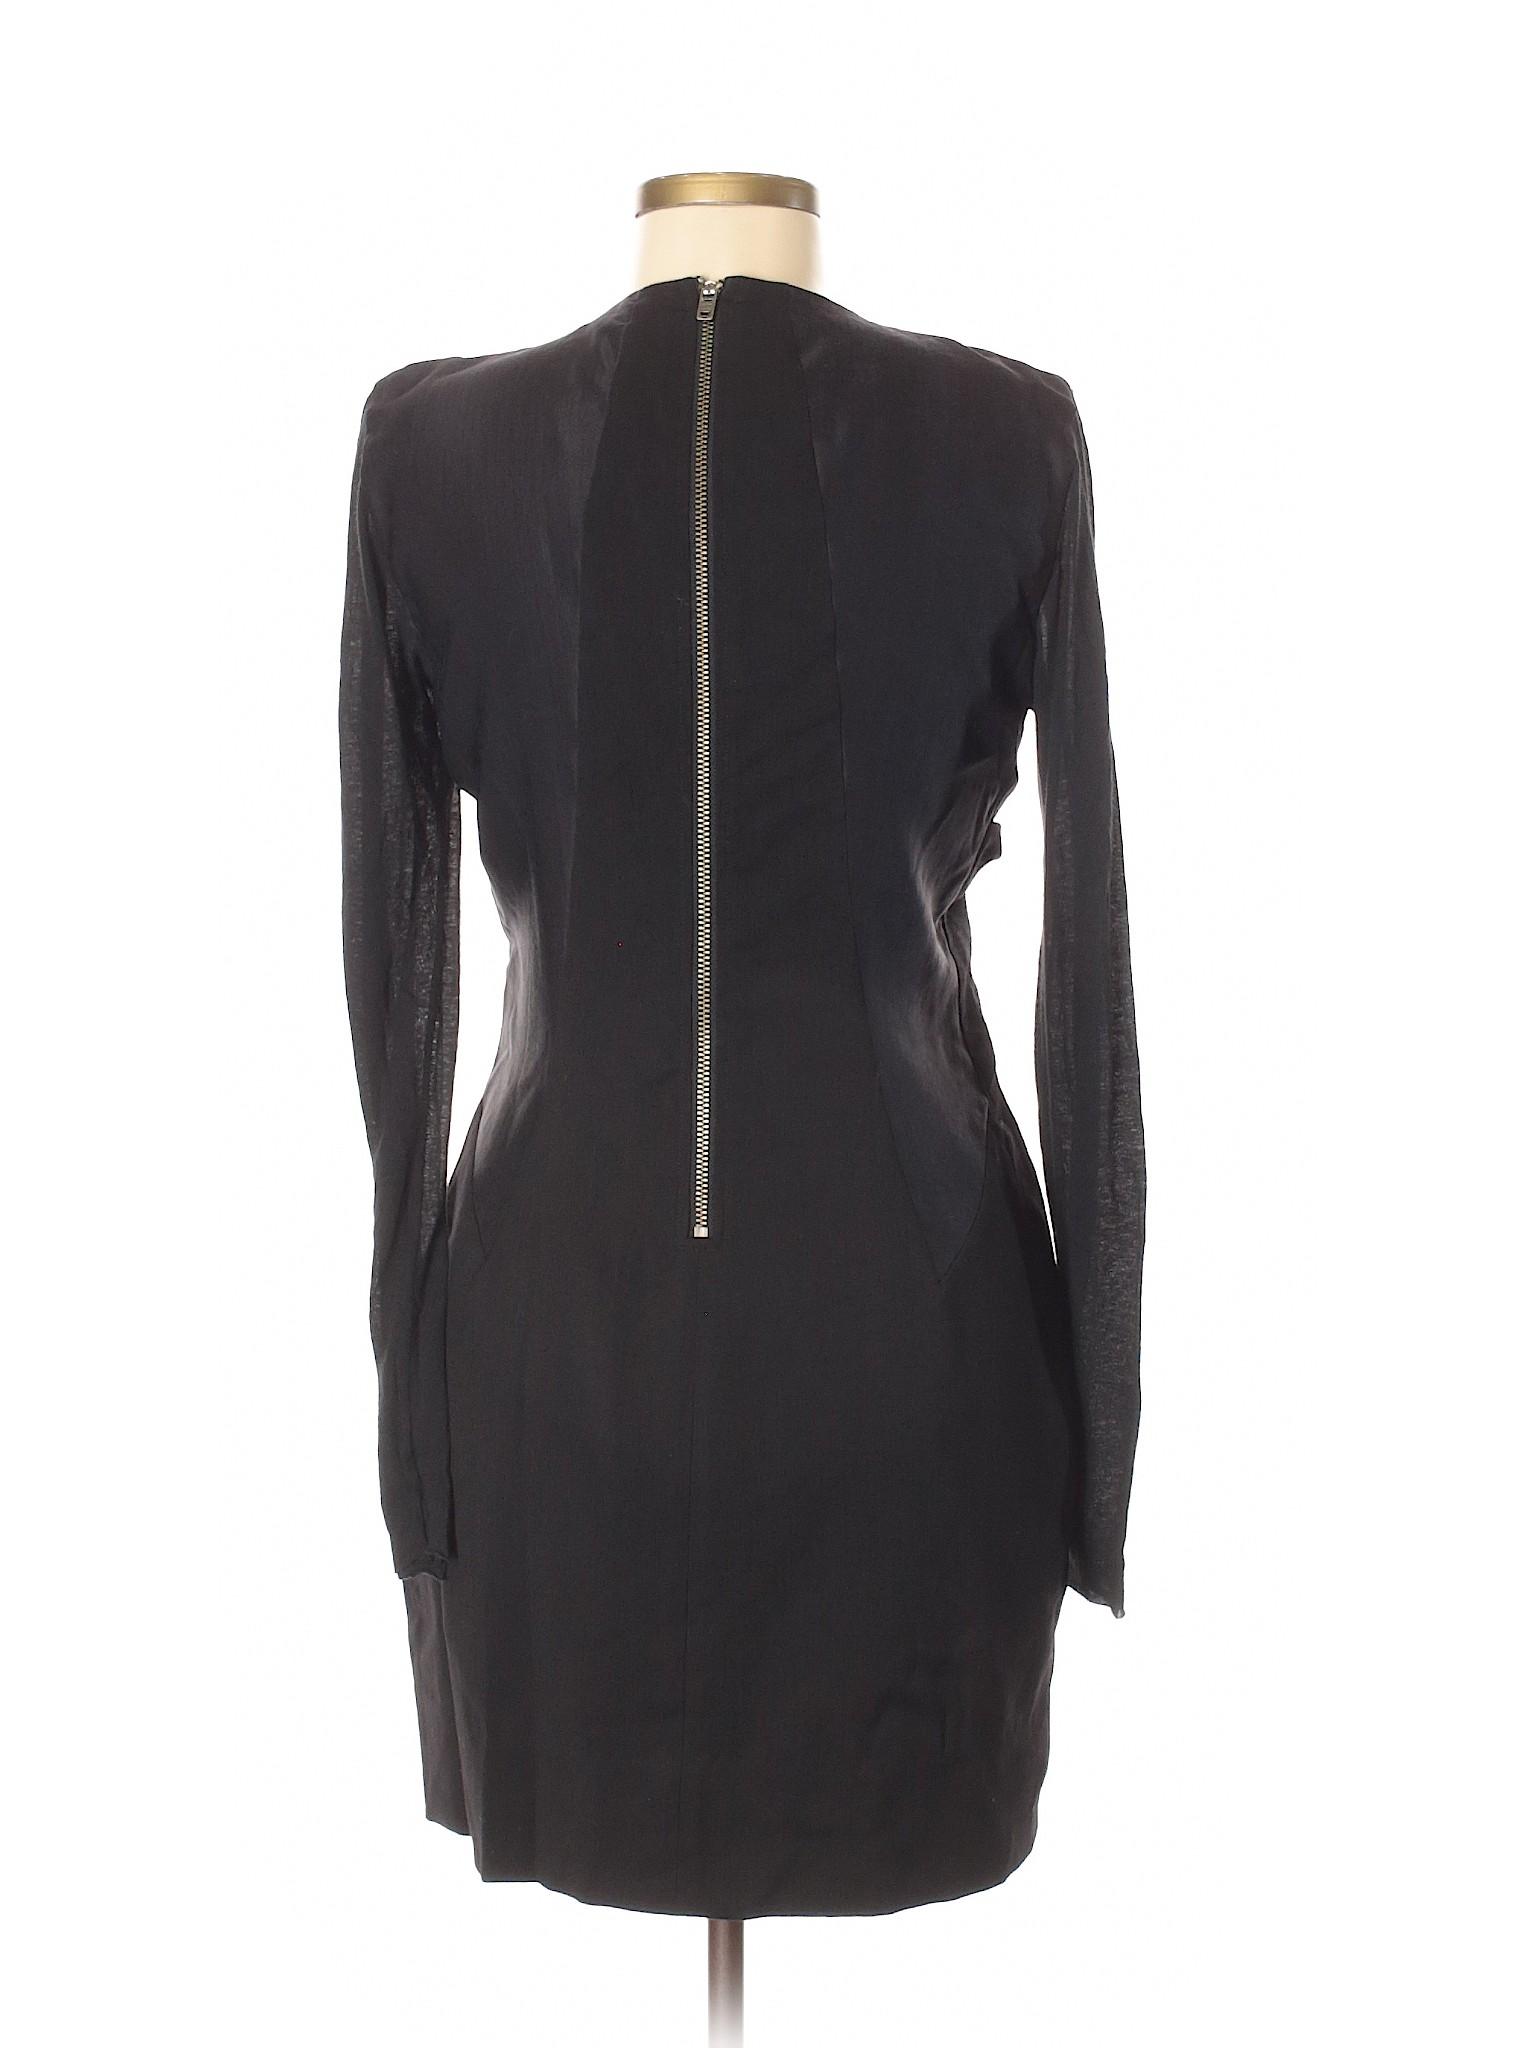 Boutique Helmut Casual Dress winter Lang RwXwUxq81r